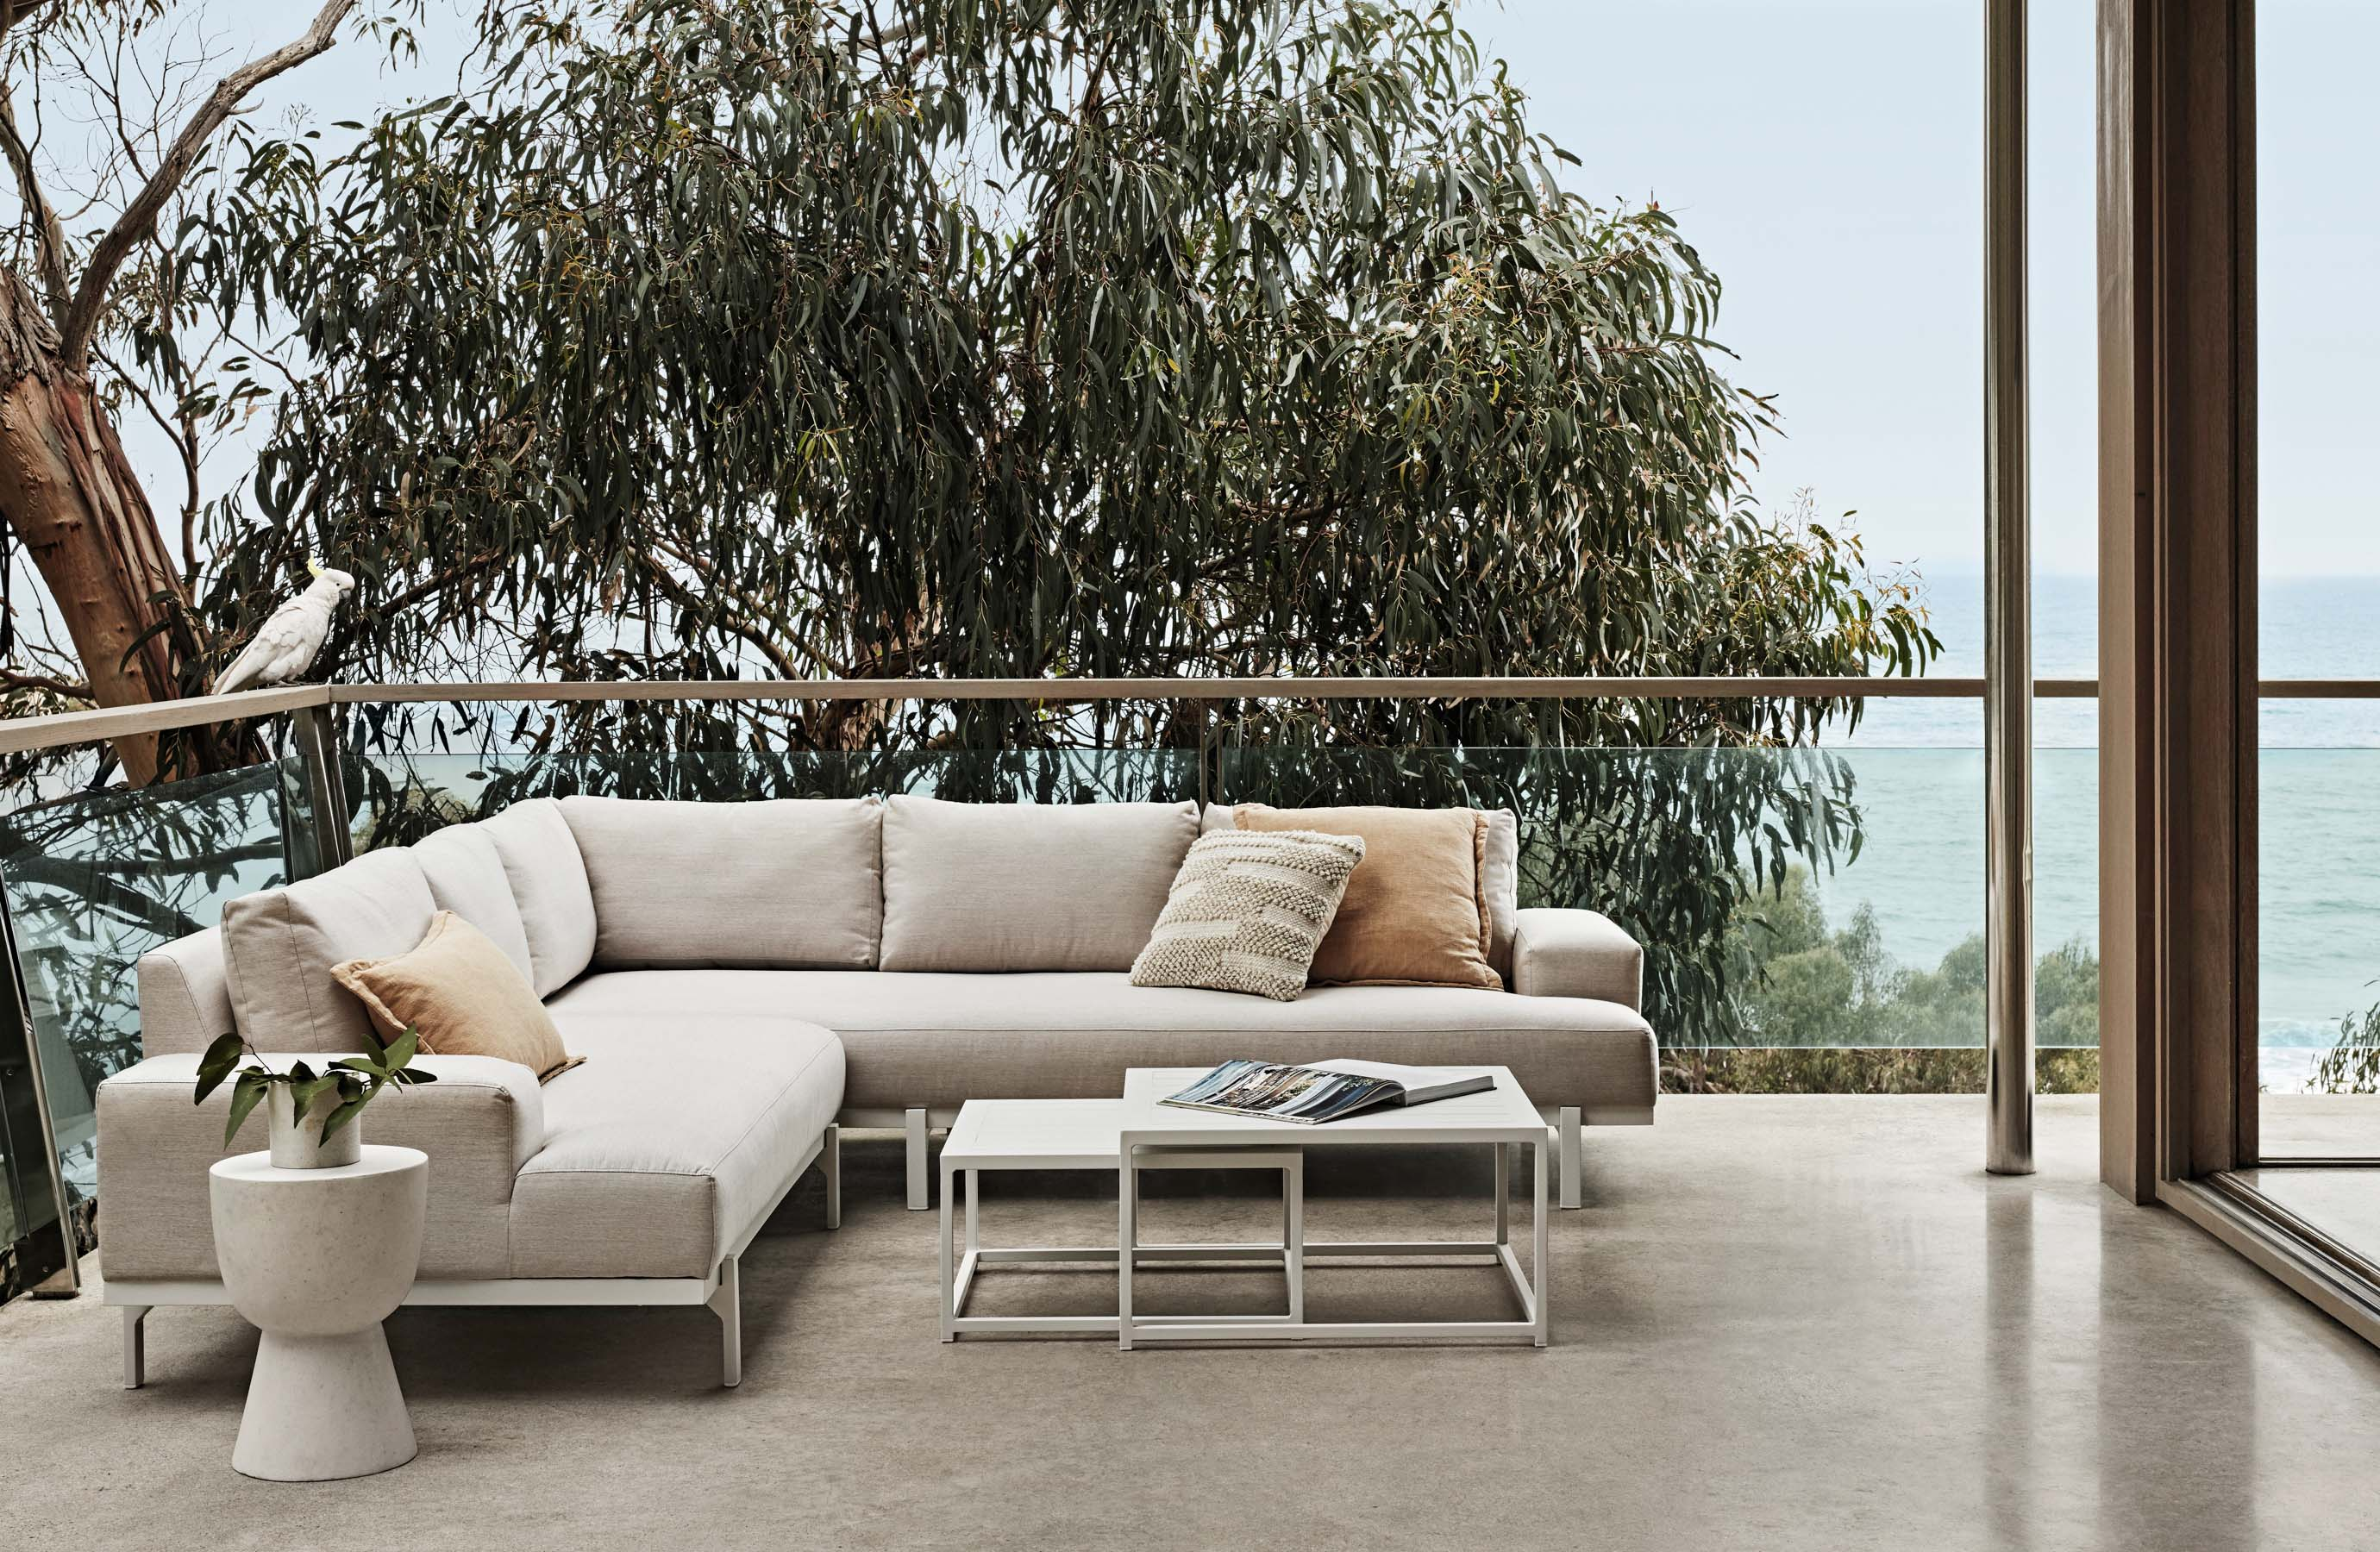 Furniture Gallery Sofas aruba-platform-two-seater-02